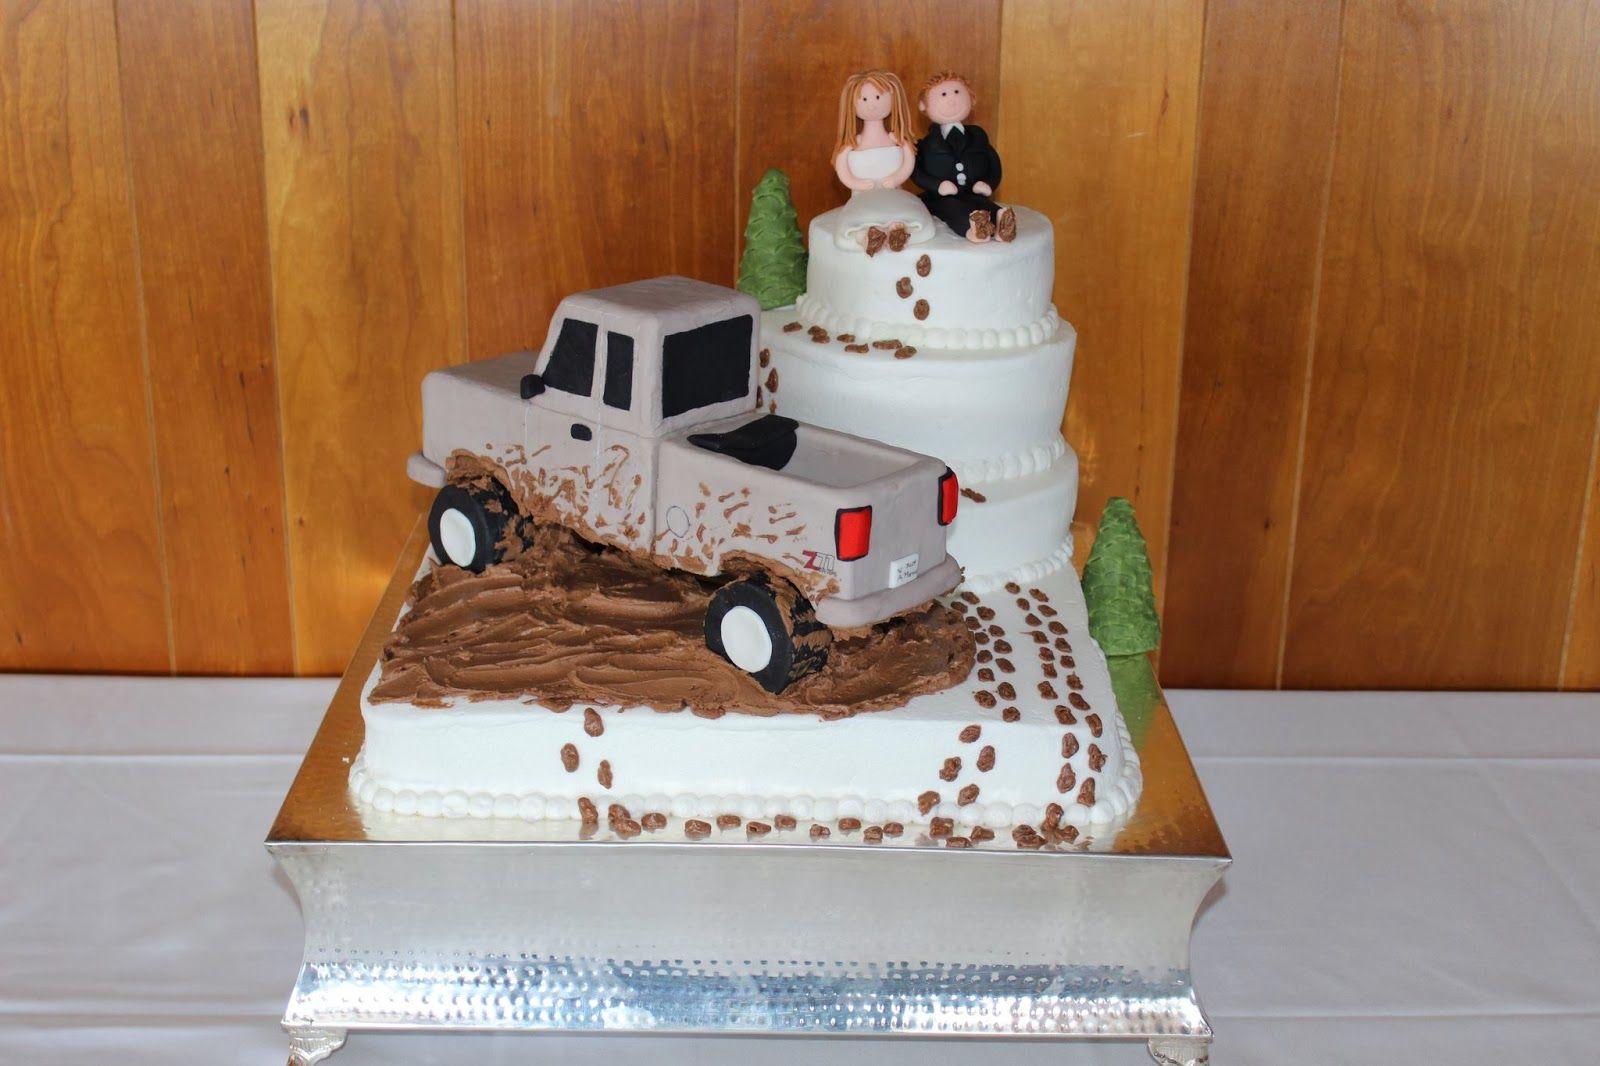 Mudding Grooms Cake  Mud Truck Wedding Cakes  Cake